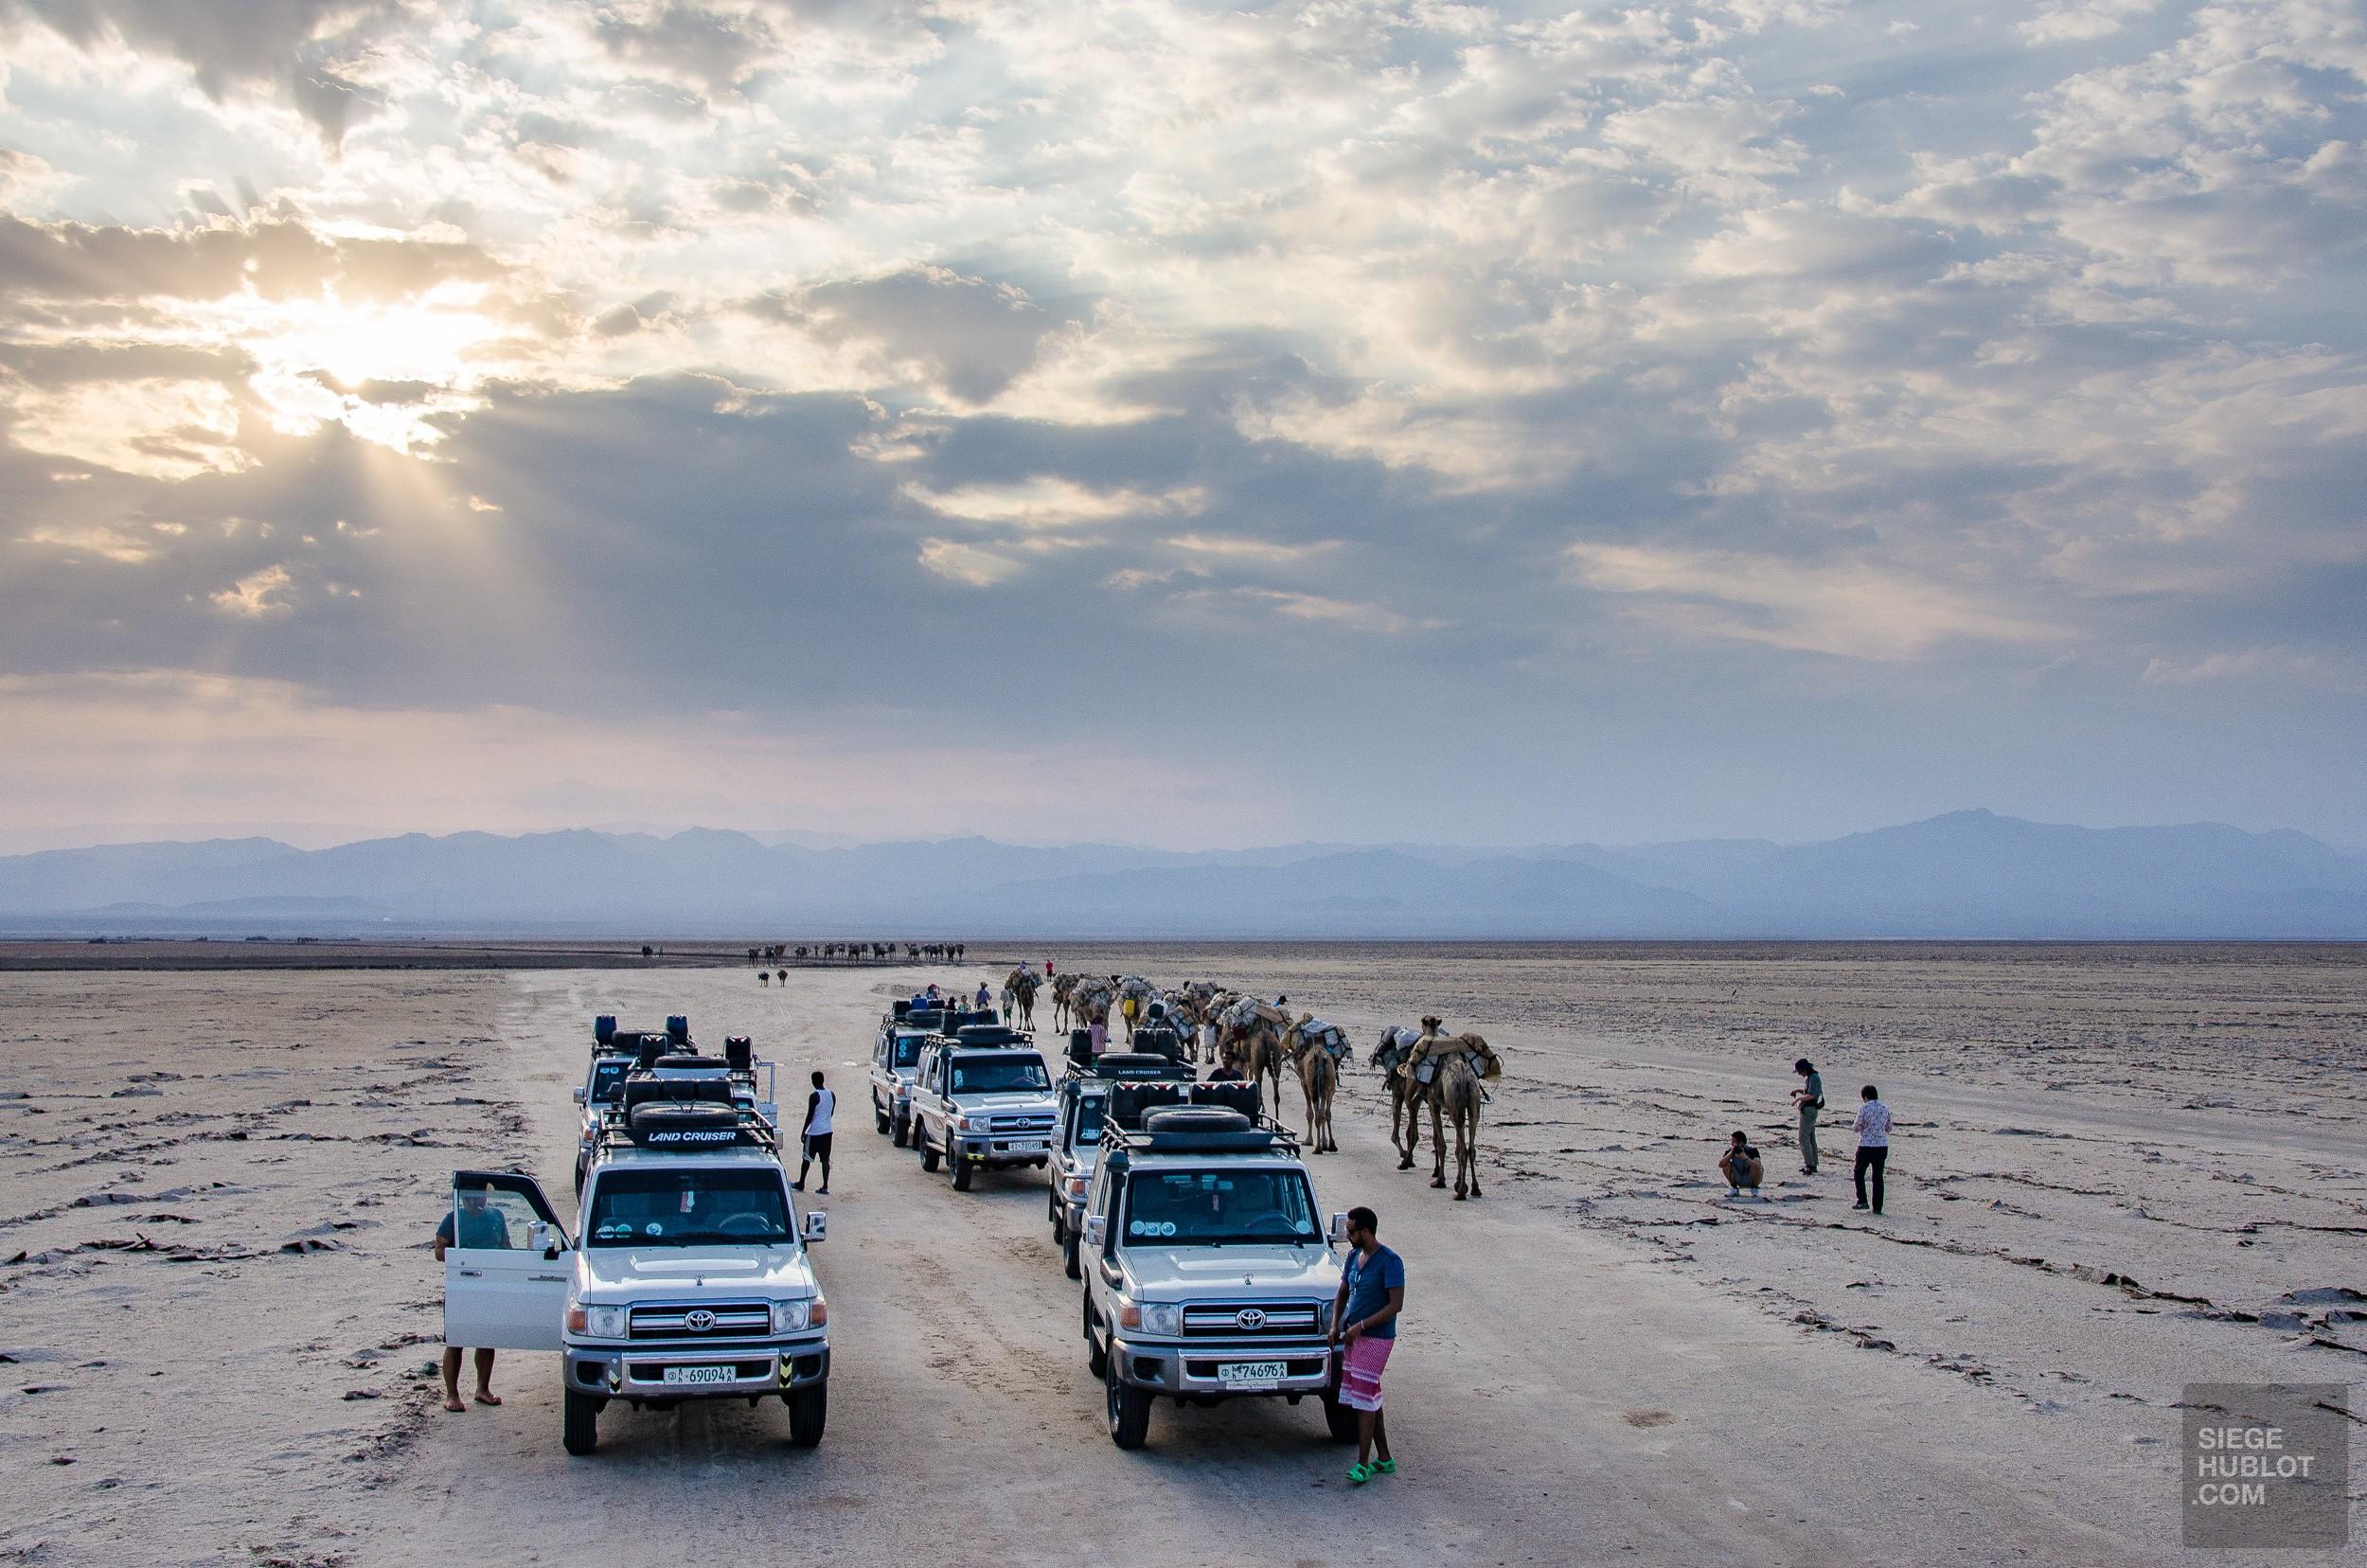 expedition desert sel - Desert de sel - Visiter une autre planete: Danakil, Ethiopie - afrique, ethiopie